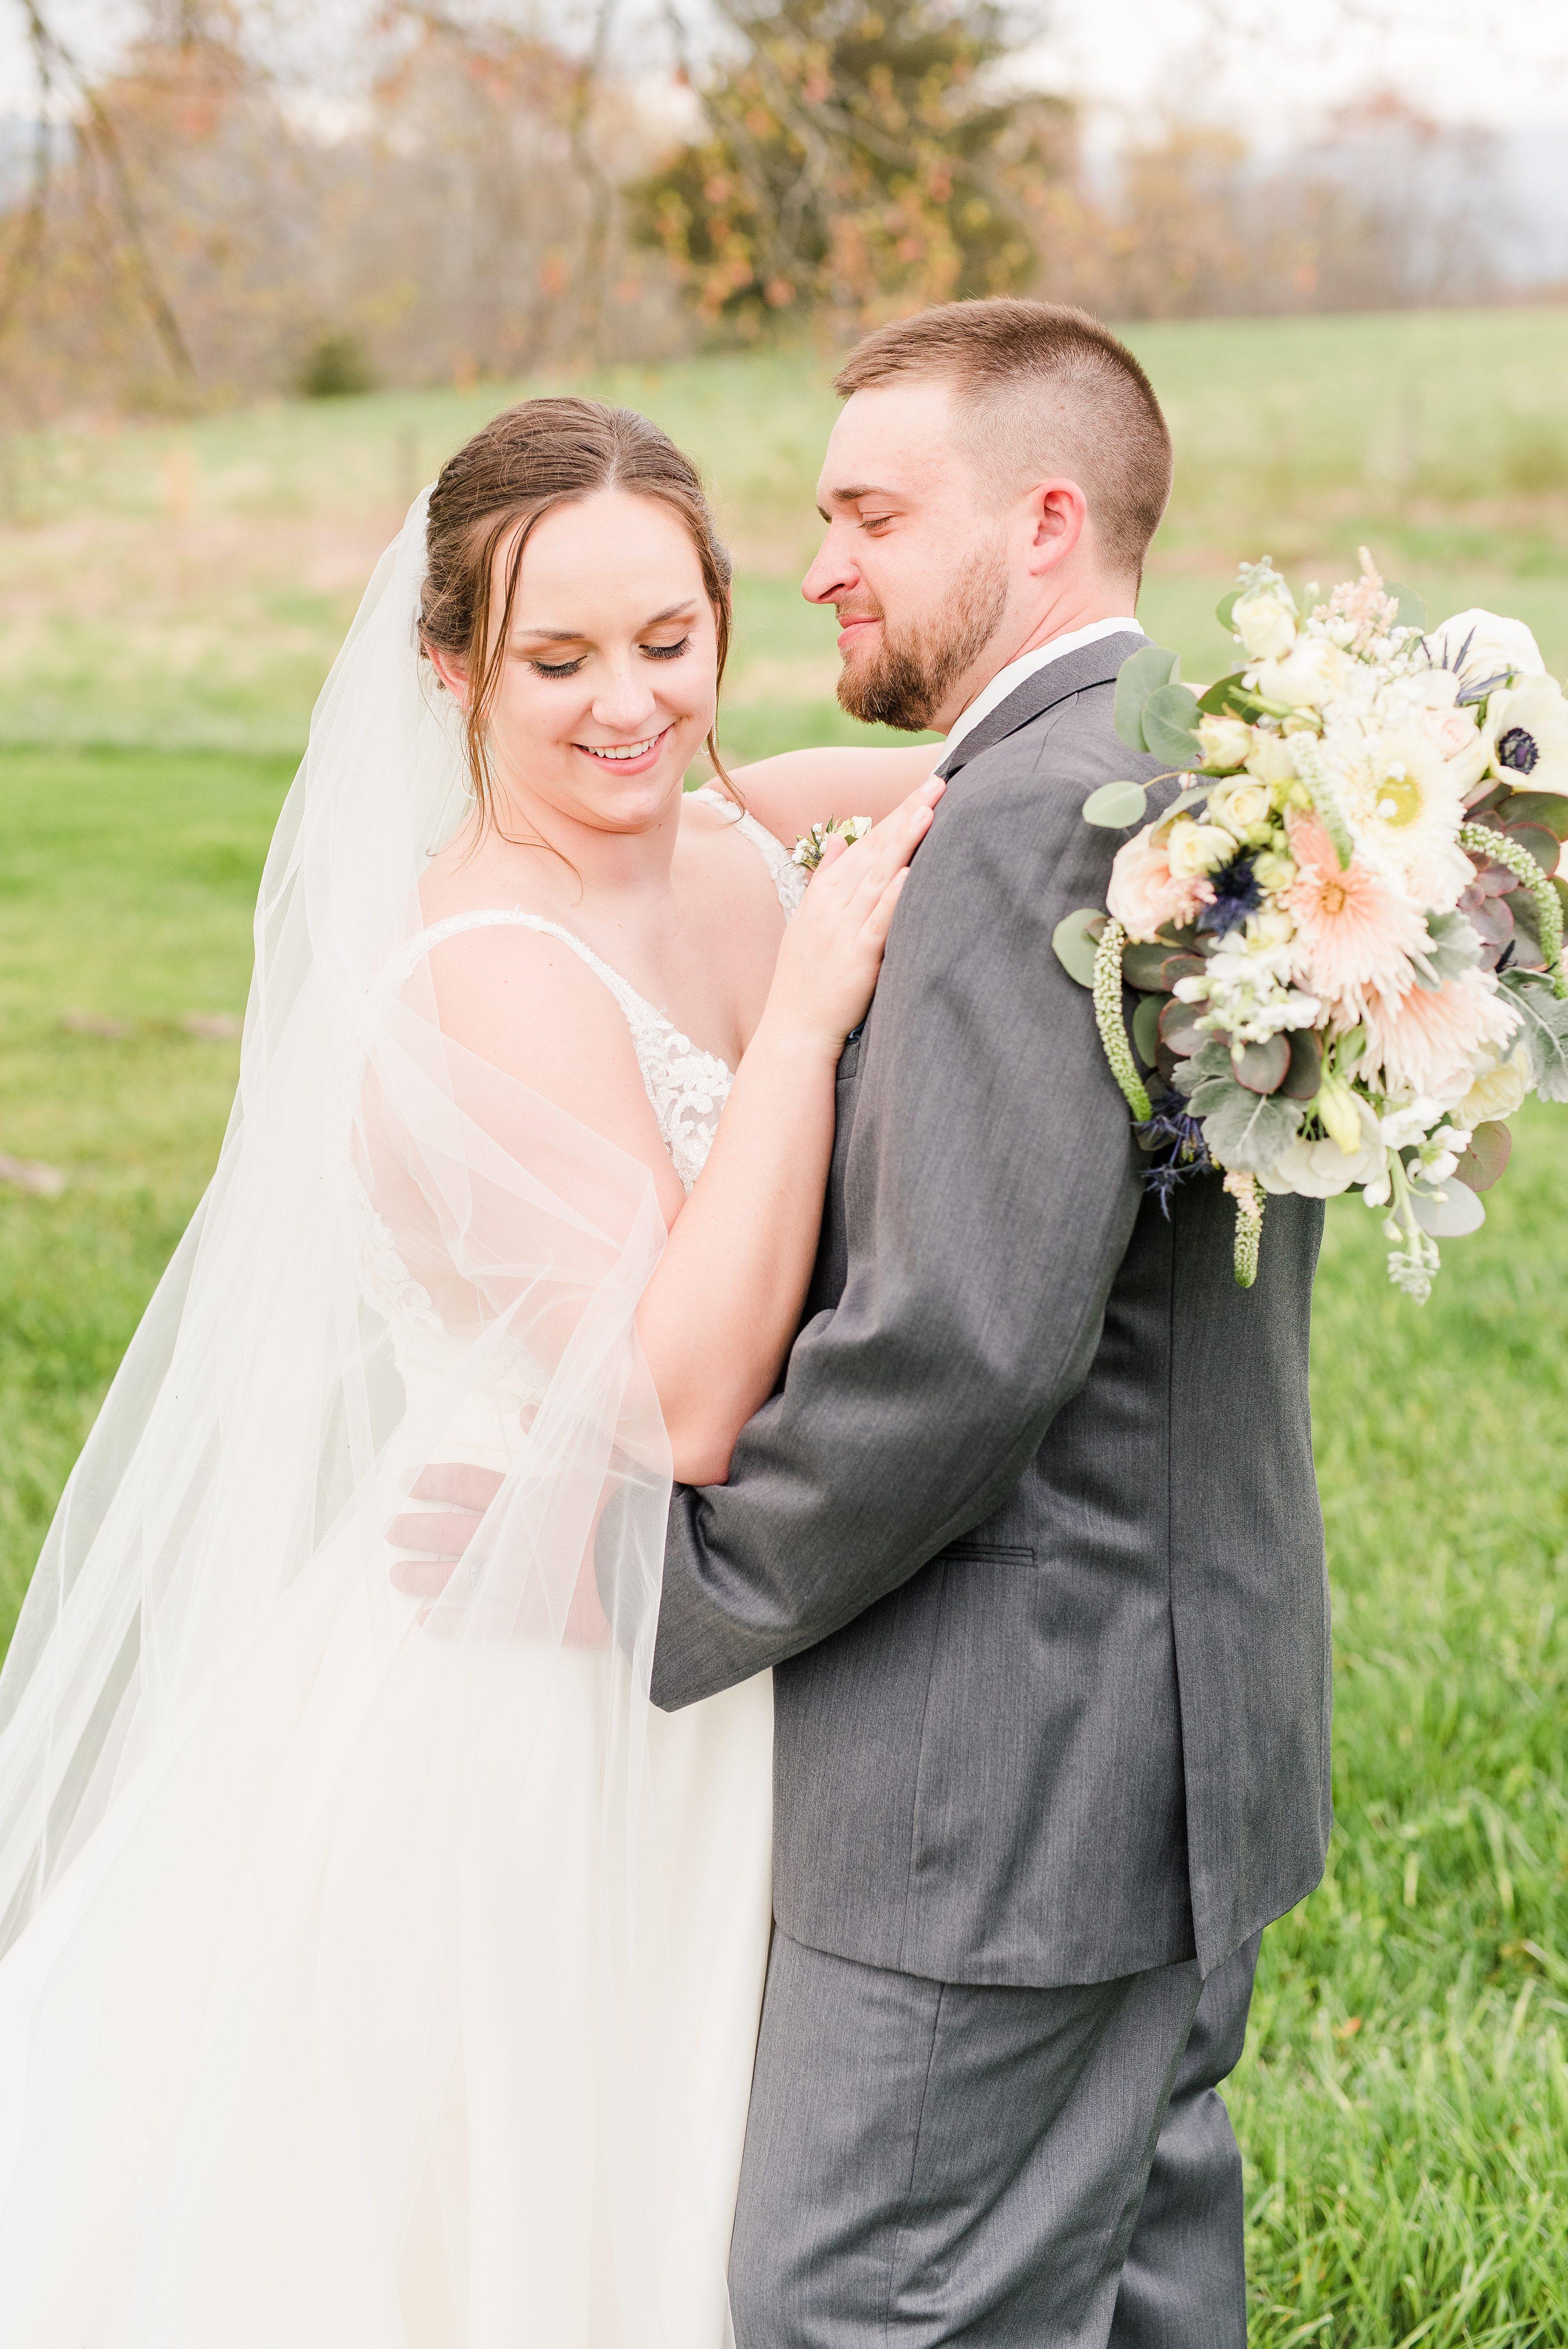 Spring Wedding,Blue Ridge,bride and groom,mountain wedding,edgewood barn,bride,groom